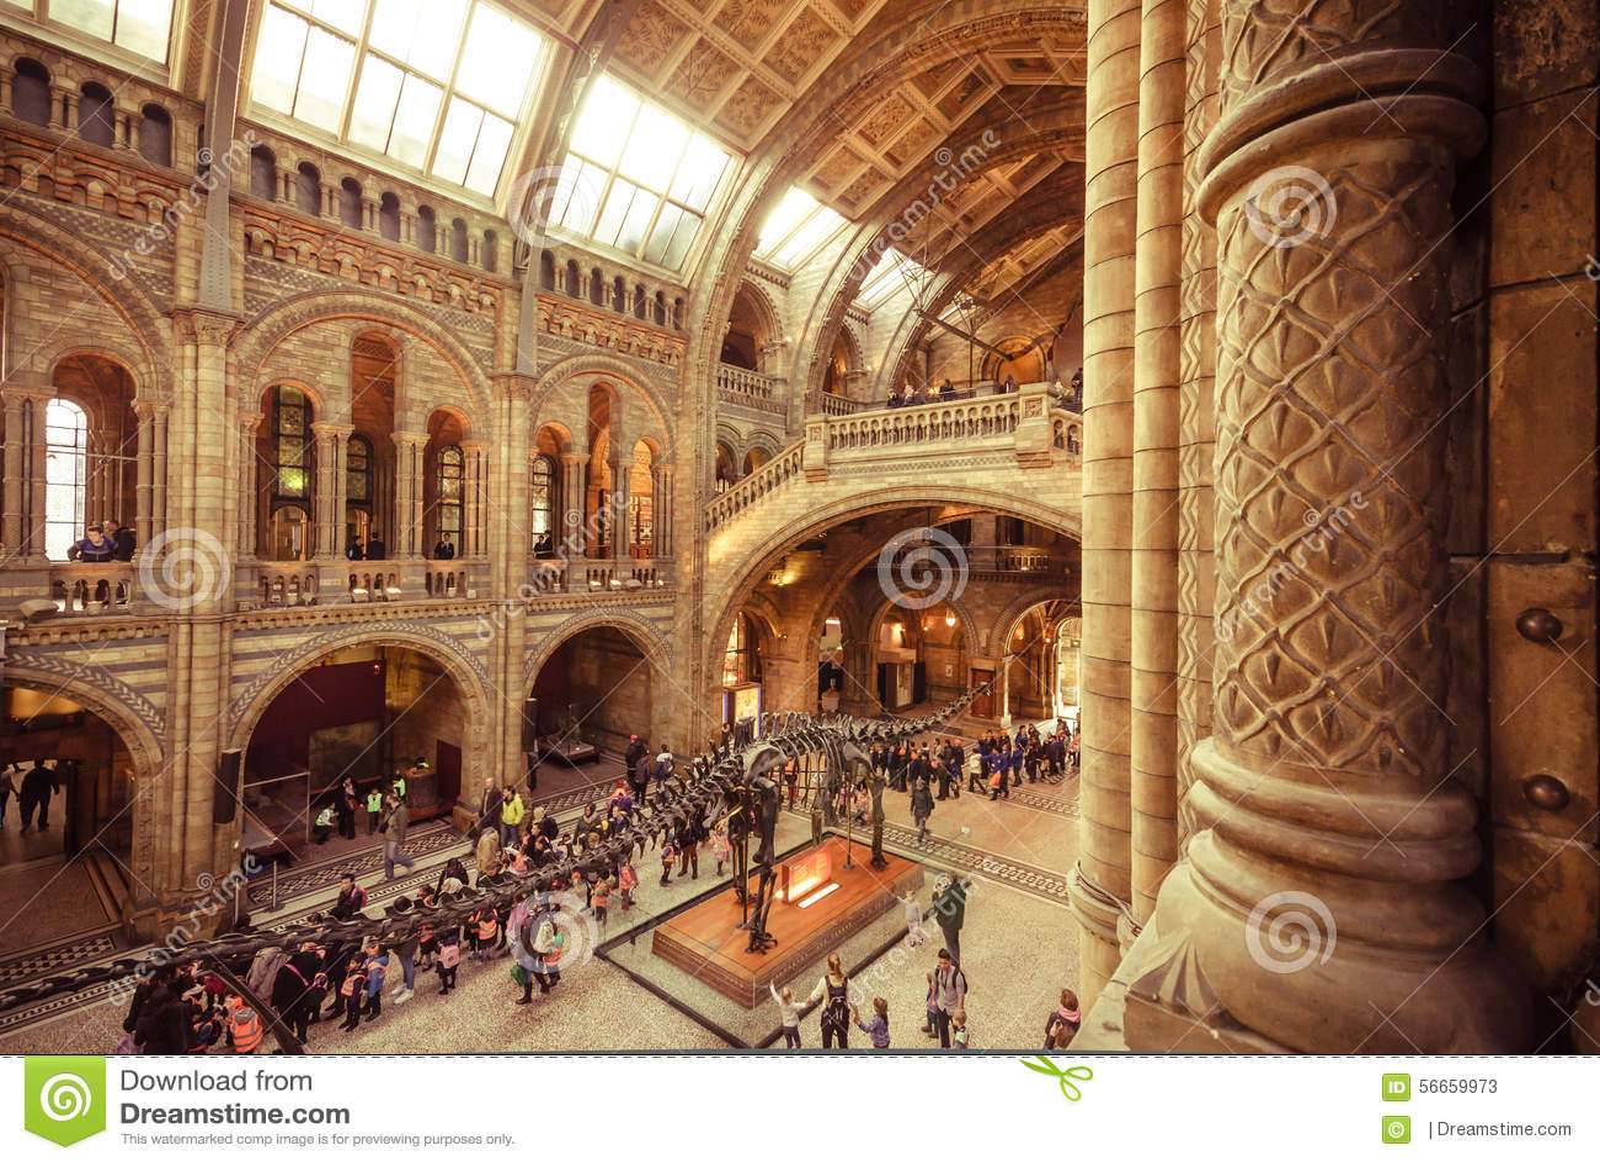 Vatican Museum Floor Plan London Museums Natural History Museum Hintze Hall